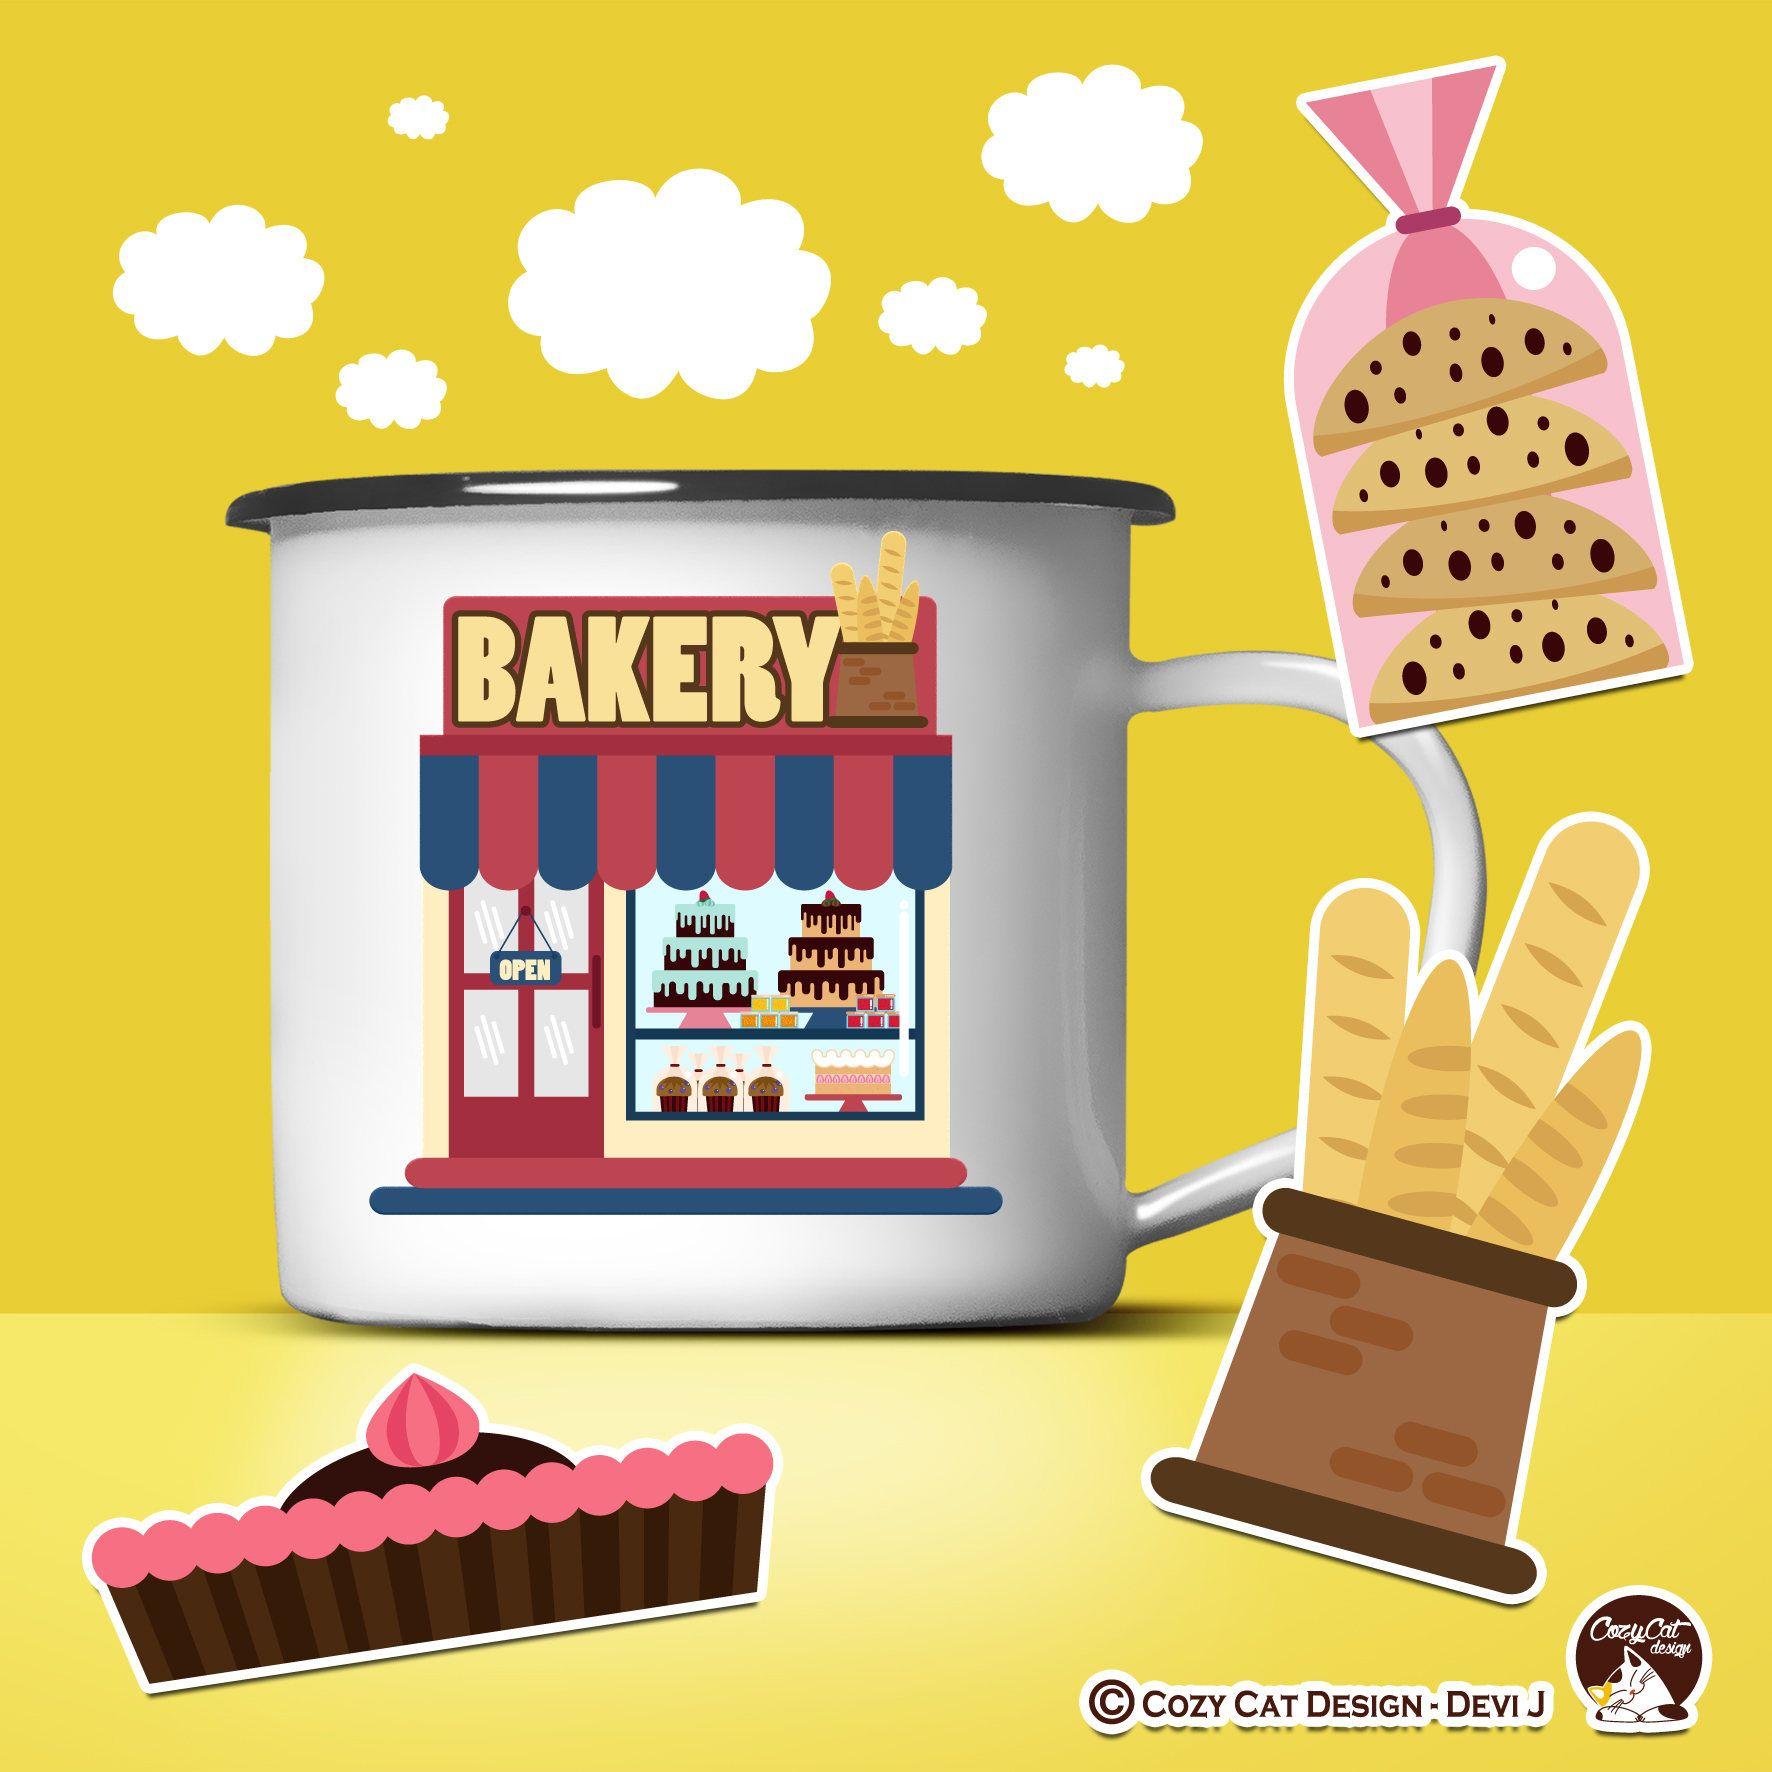 Bakery clipart baking. Cute bake cake bread